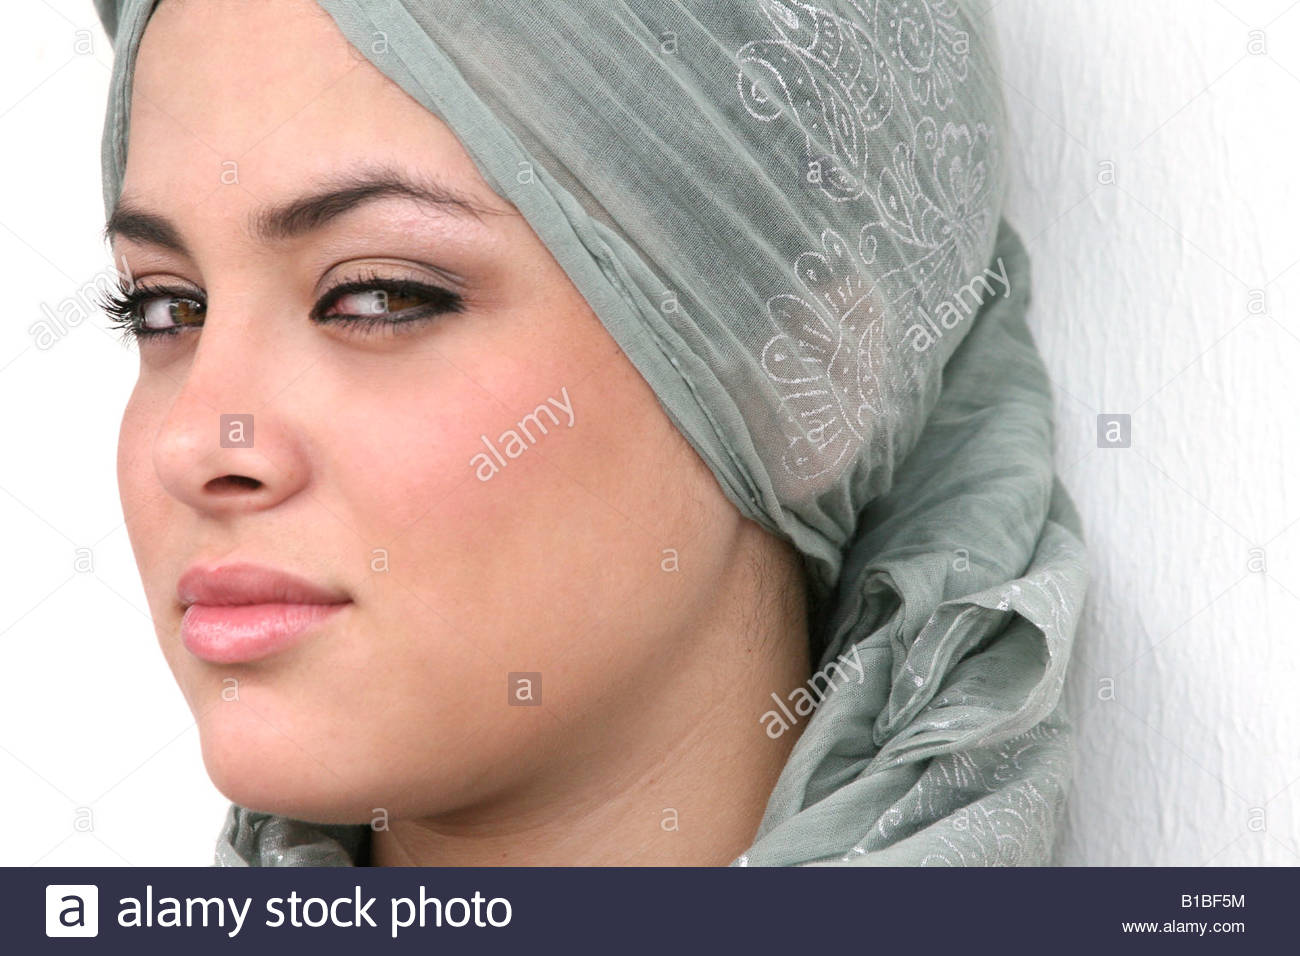 Asian Bouddhistes Musulmans Arabes Indiennes Fille Femme